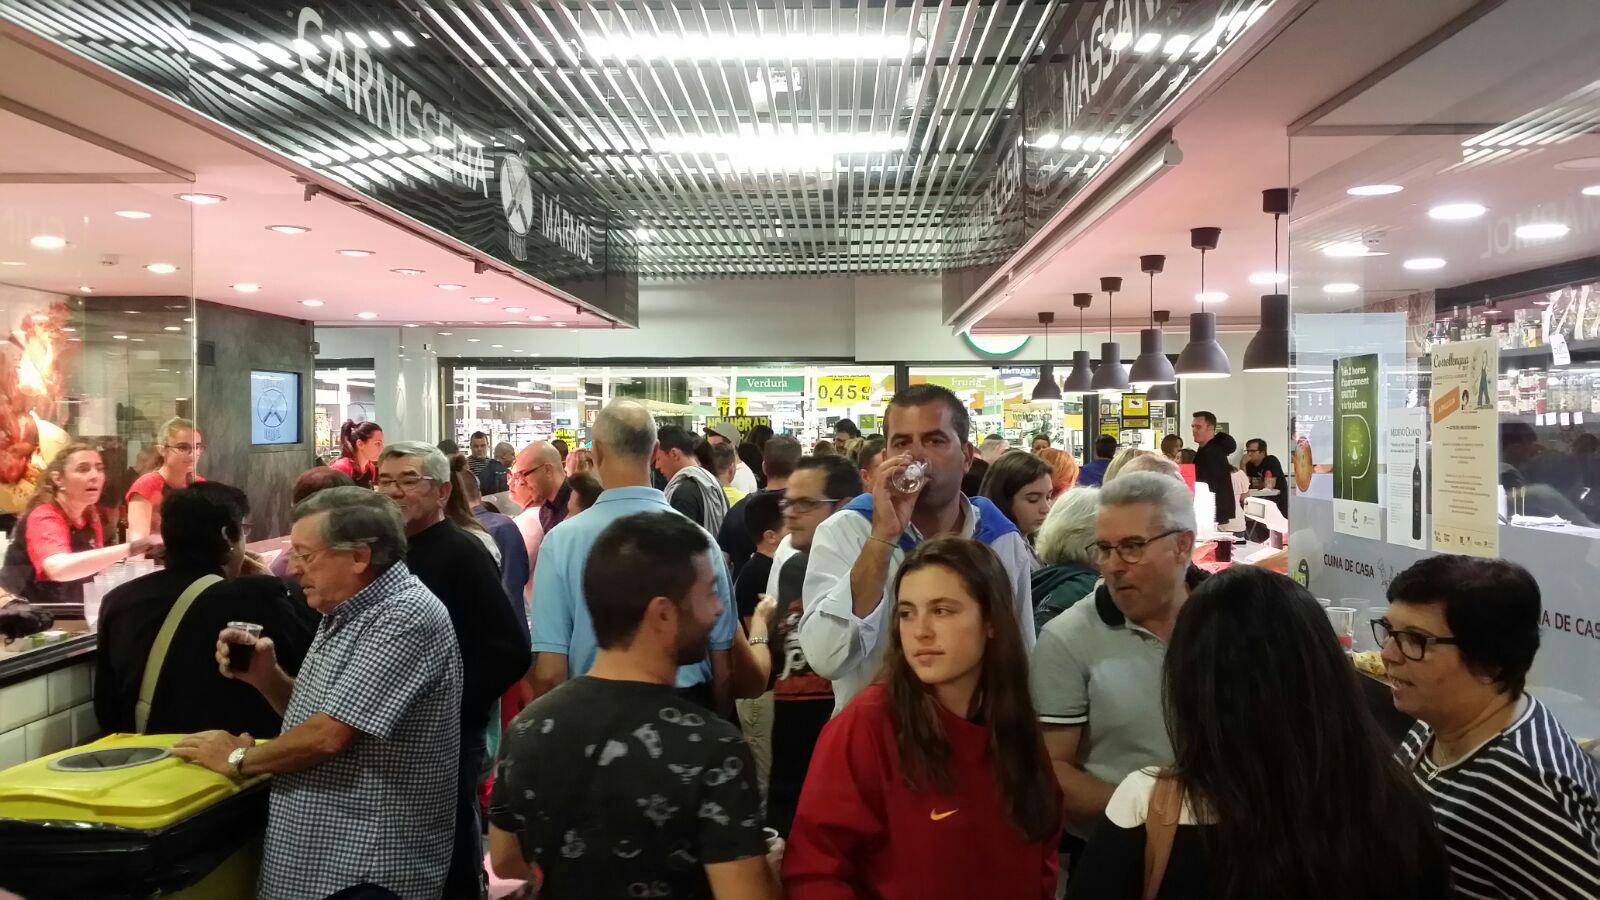 Nit de Tapes Mercat Municipal Pallejà